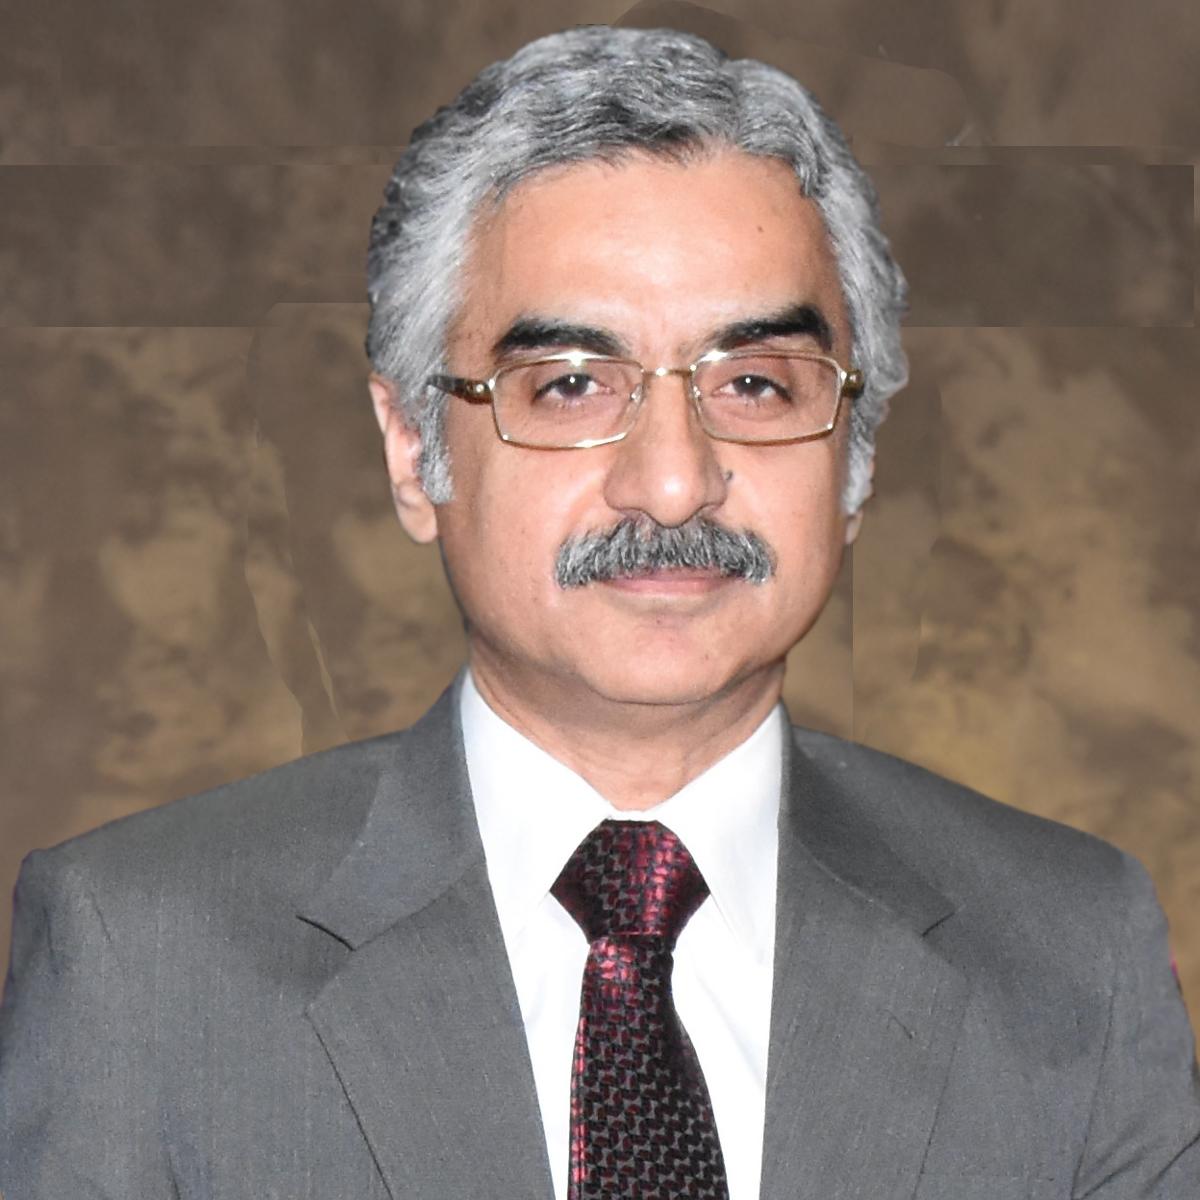 Mubeen Mirza